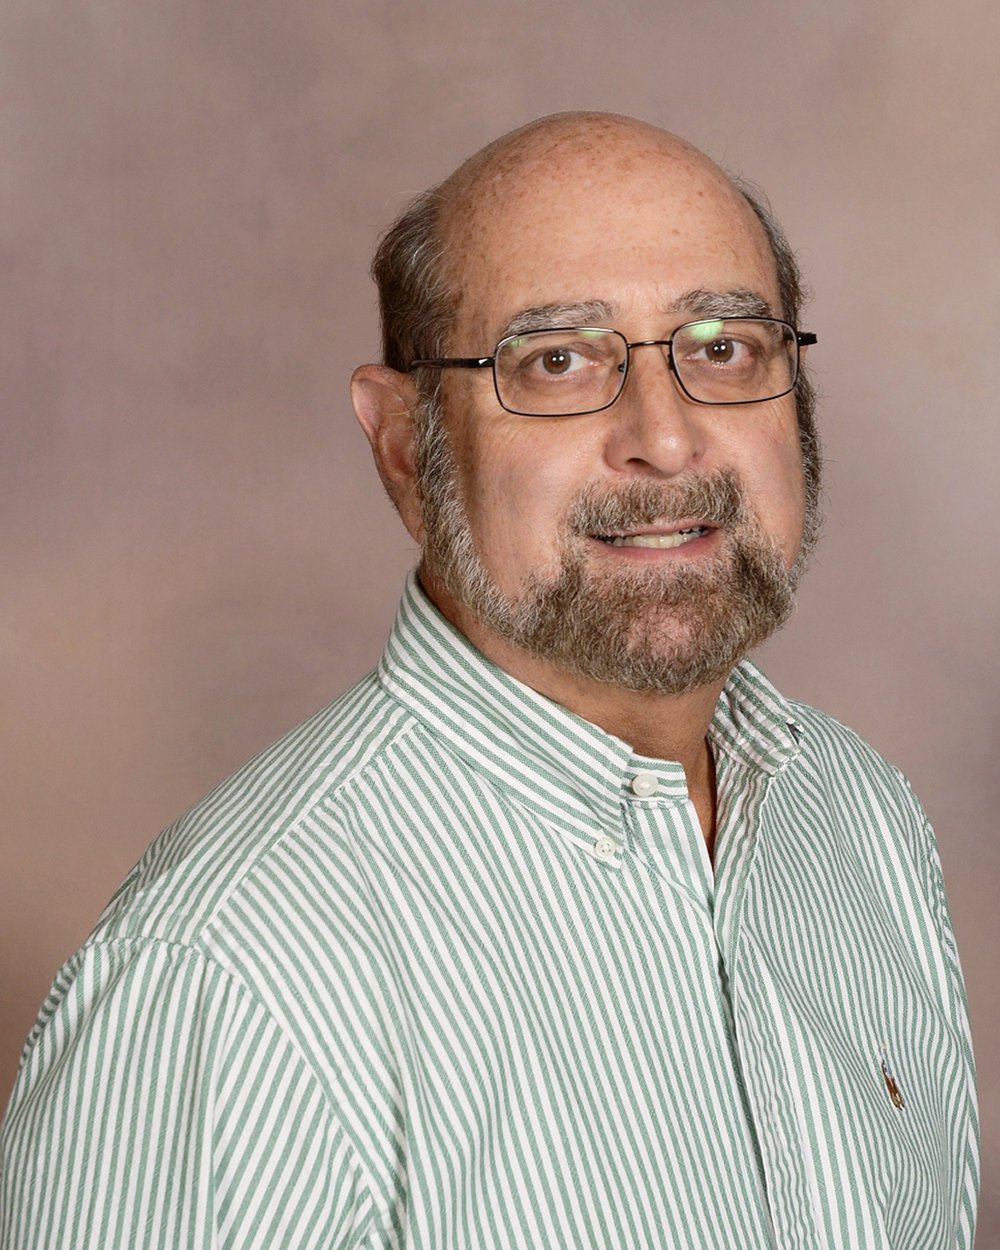 David Hosman